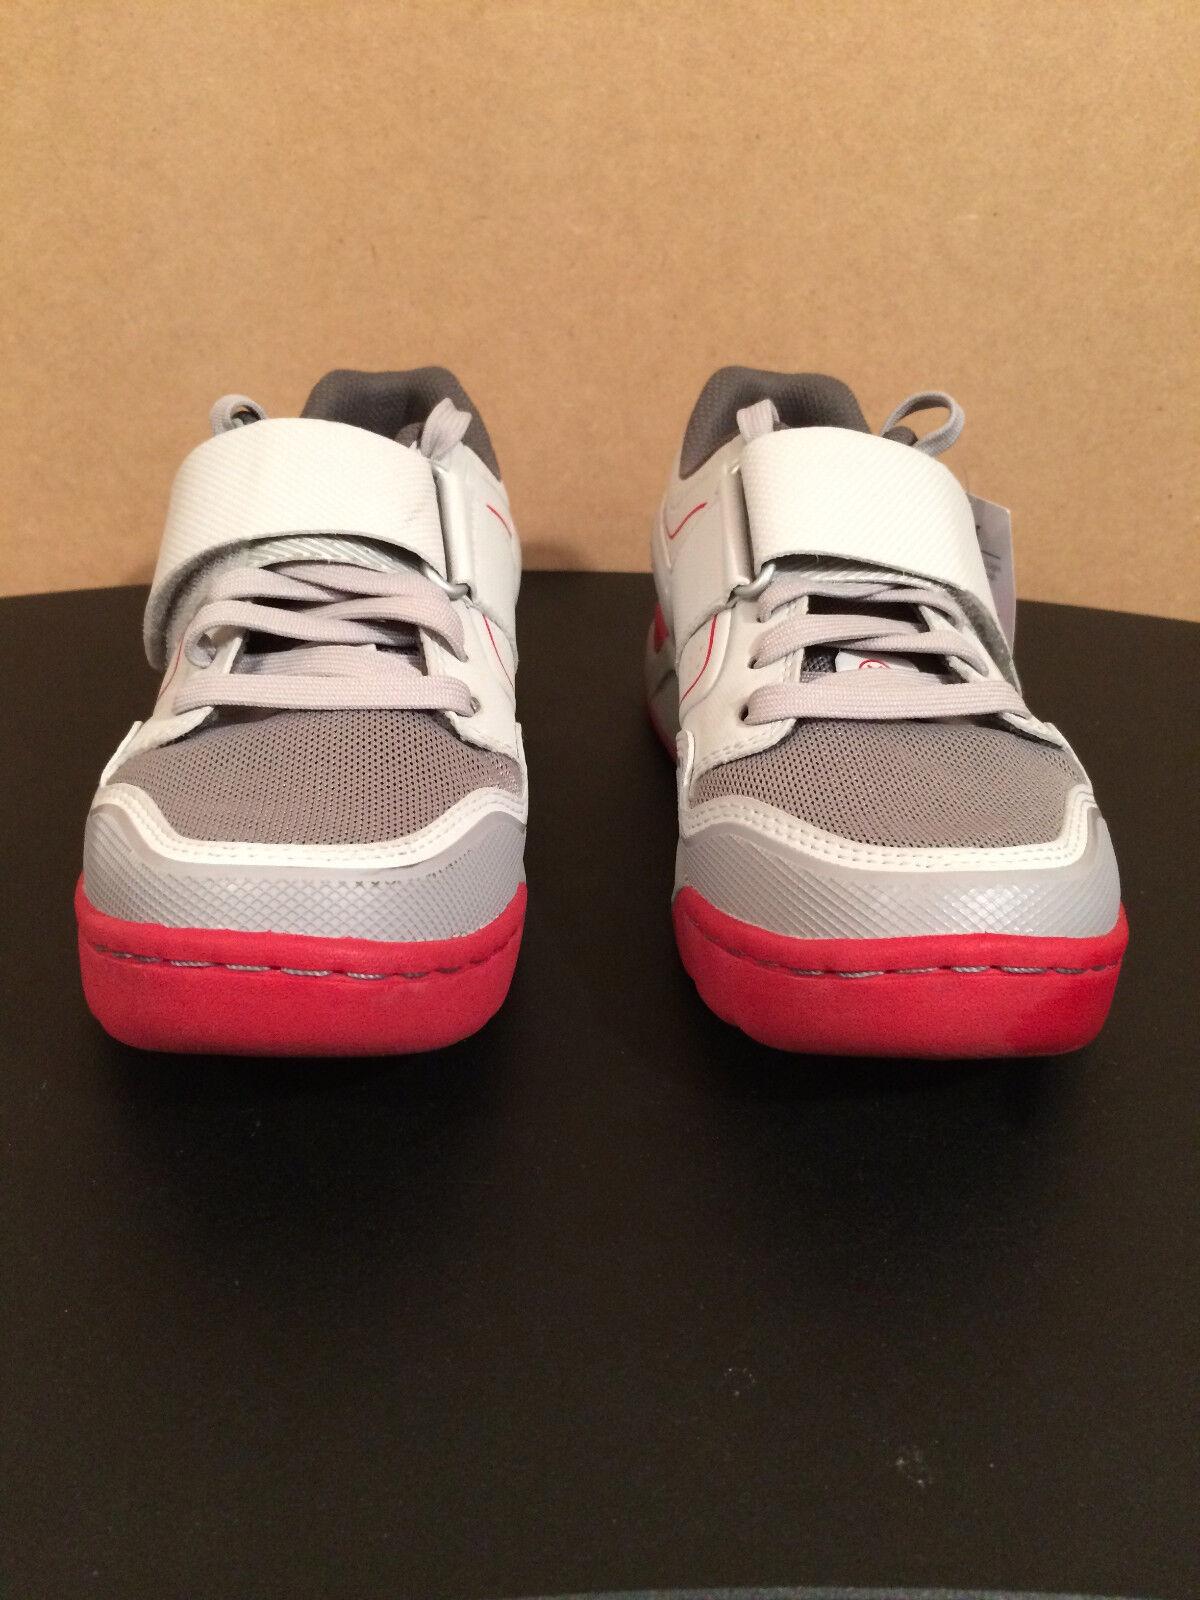 Teva Größe: Pivot Bike Collection Schuhes, Größe: Teva   Herren 5, New With Tags 80195a